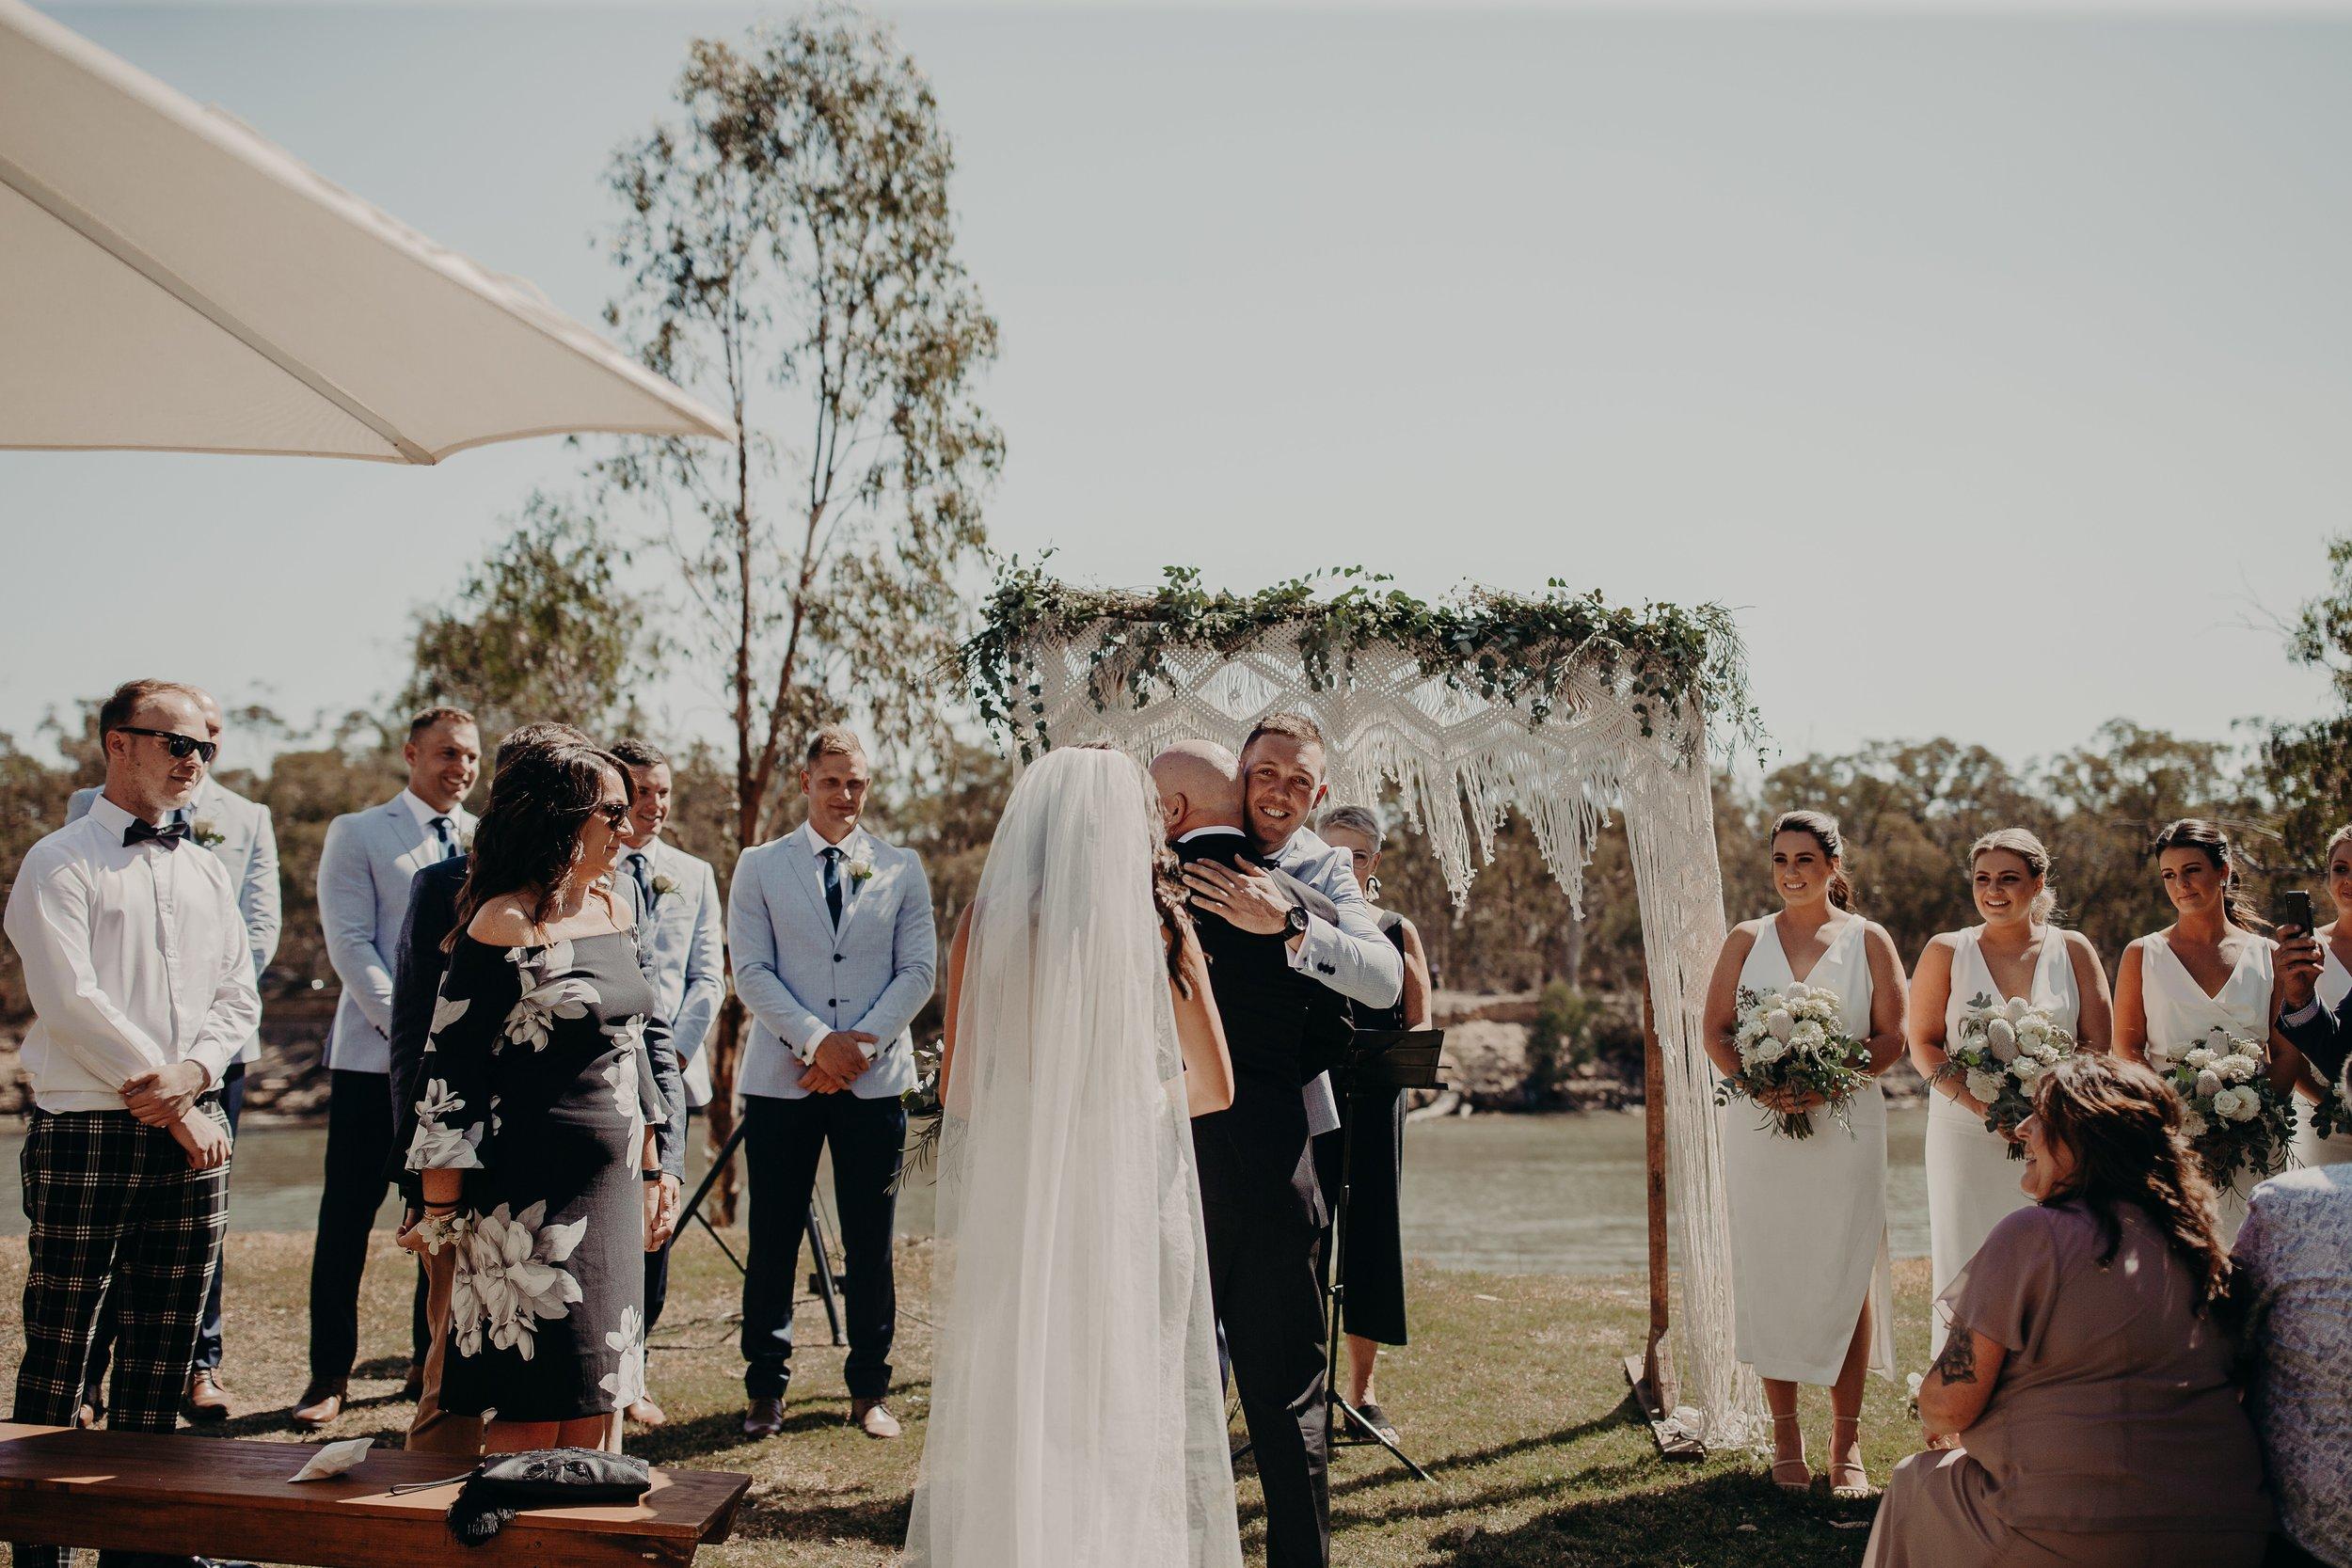 mickalathomas_puremacphotography_weddingphotographer_couplephotographer_Sheppartonphotographer_2871.jpg